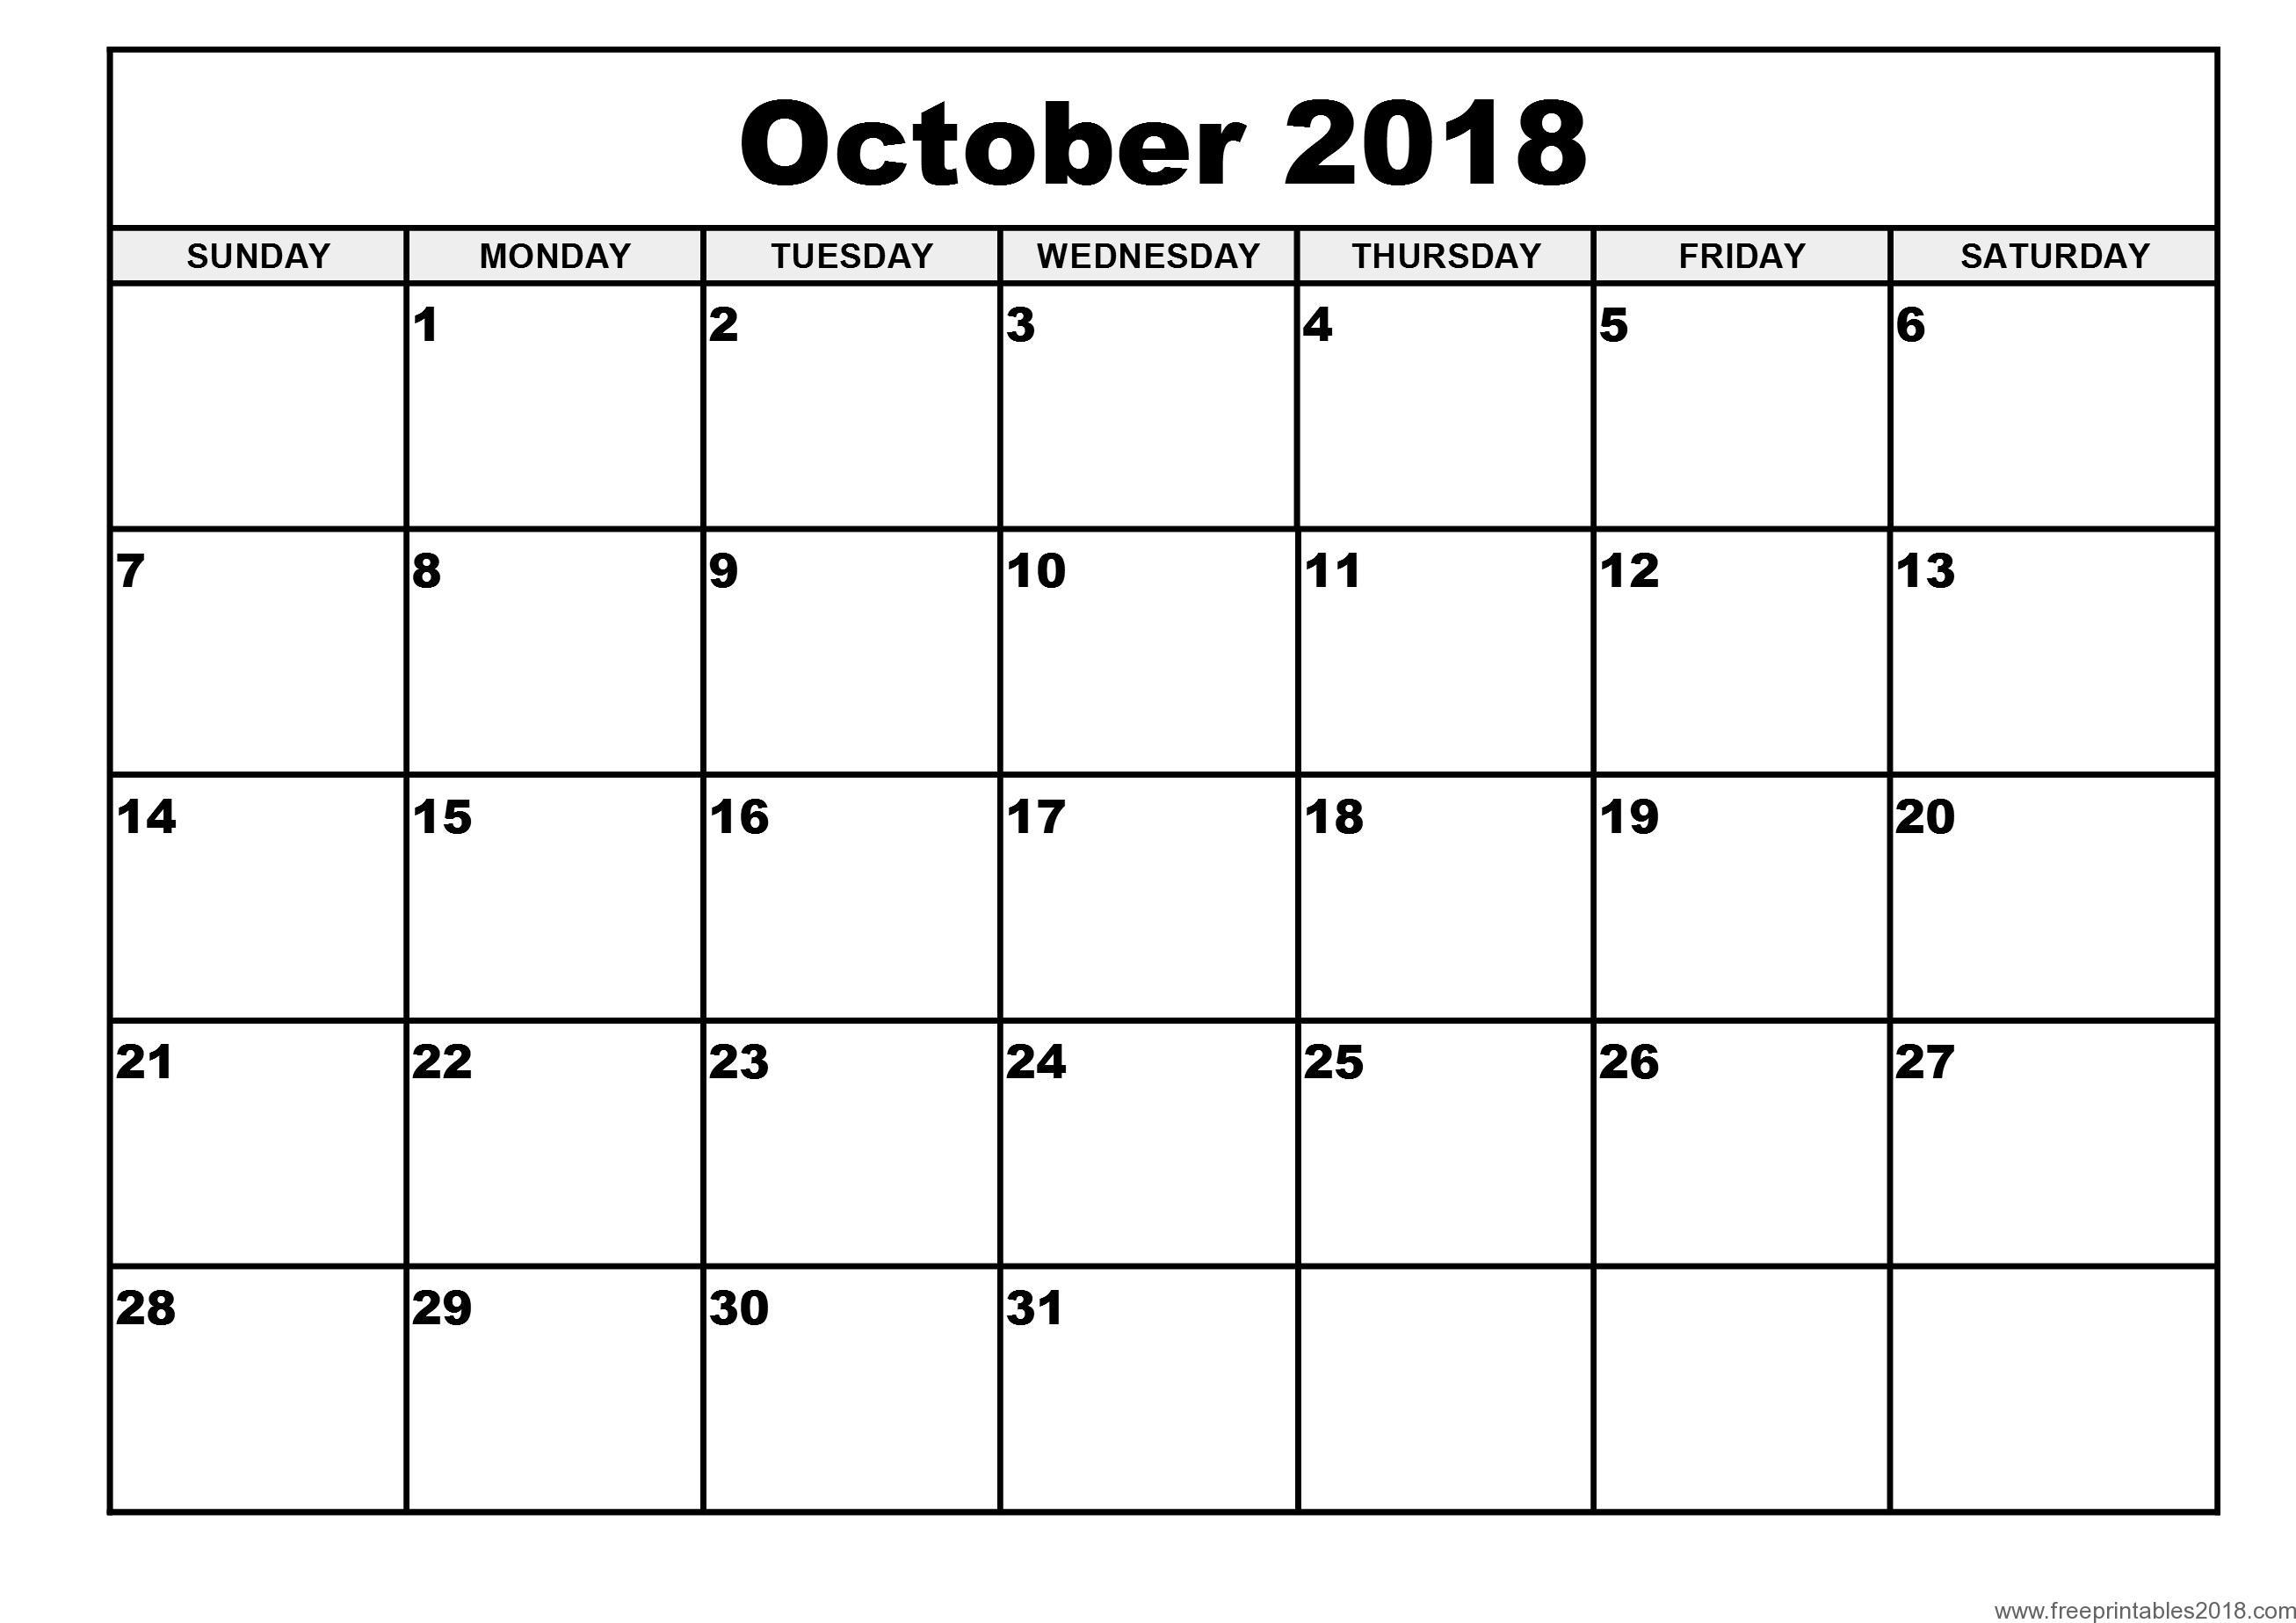 Free Printable Calendar October 2018 | Free Printables 2019 in Monday To Sunday Calendar Template October